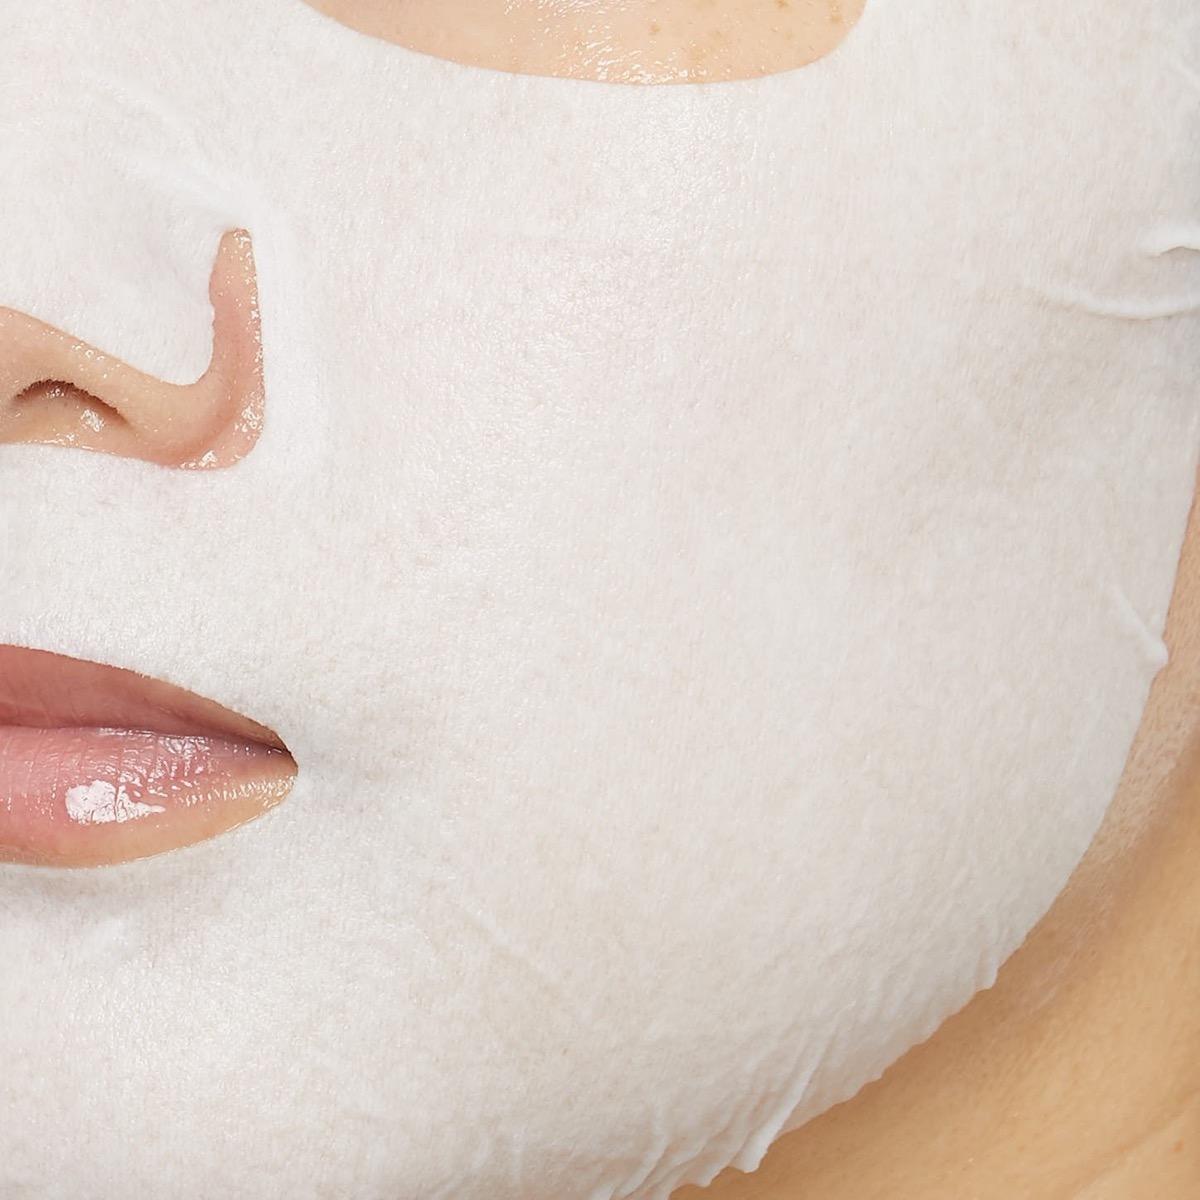 Real Barrier(リアルバリア)『エクストリームクリームマスク』の使用感をレポに関する画像10